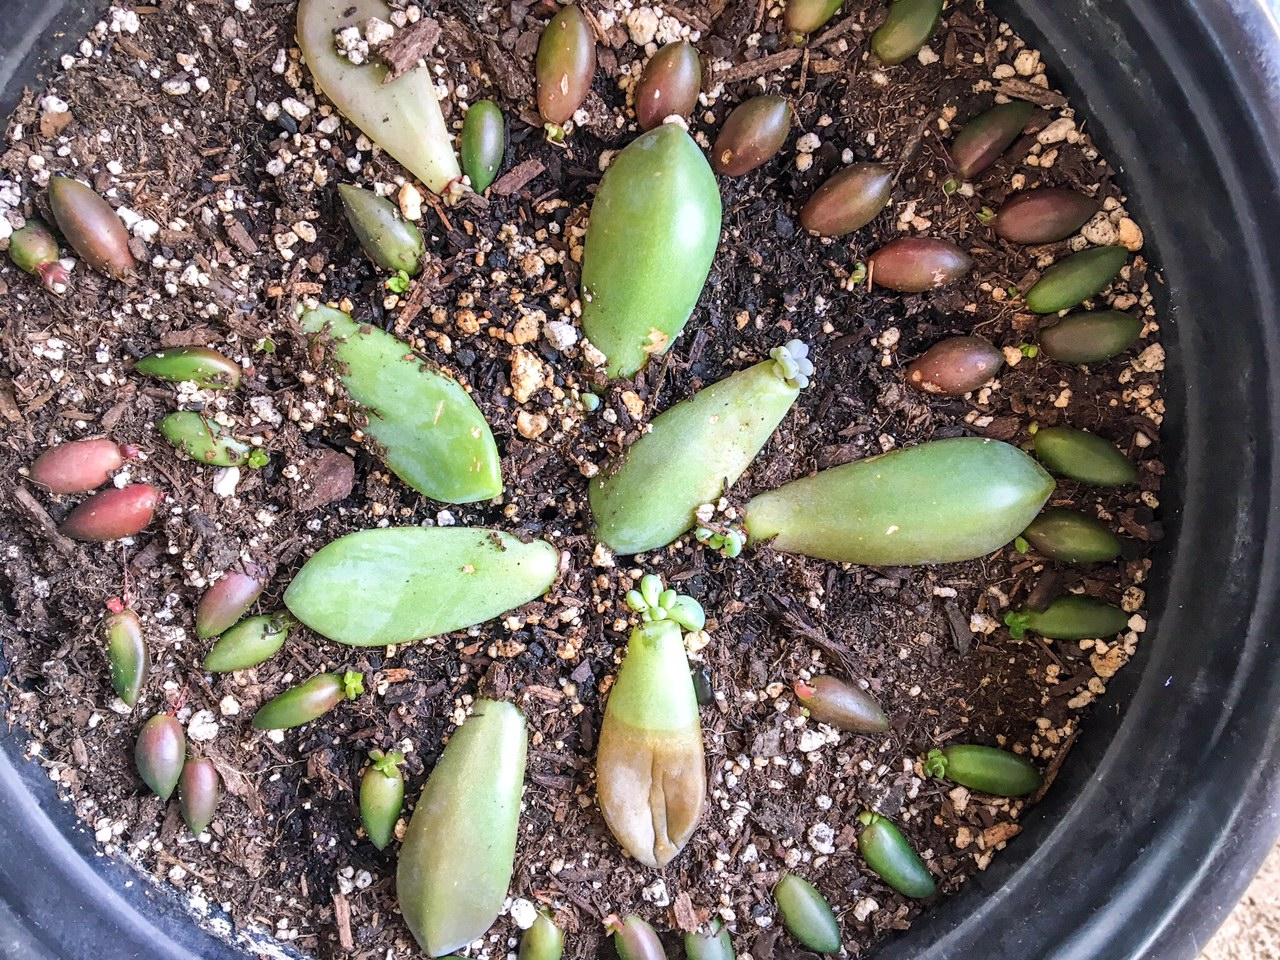 Succulent Leaf Propagation From Leaf (61 Days)